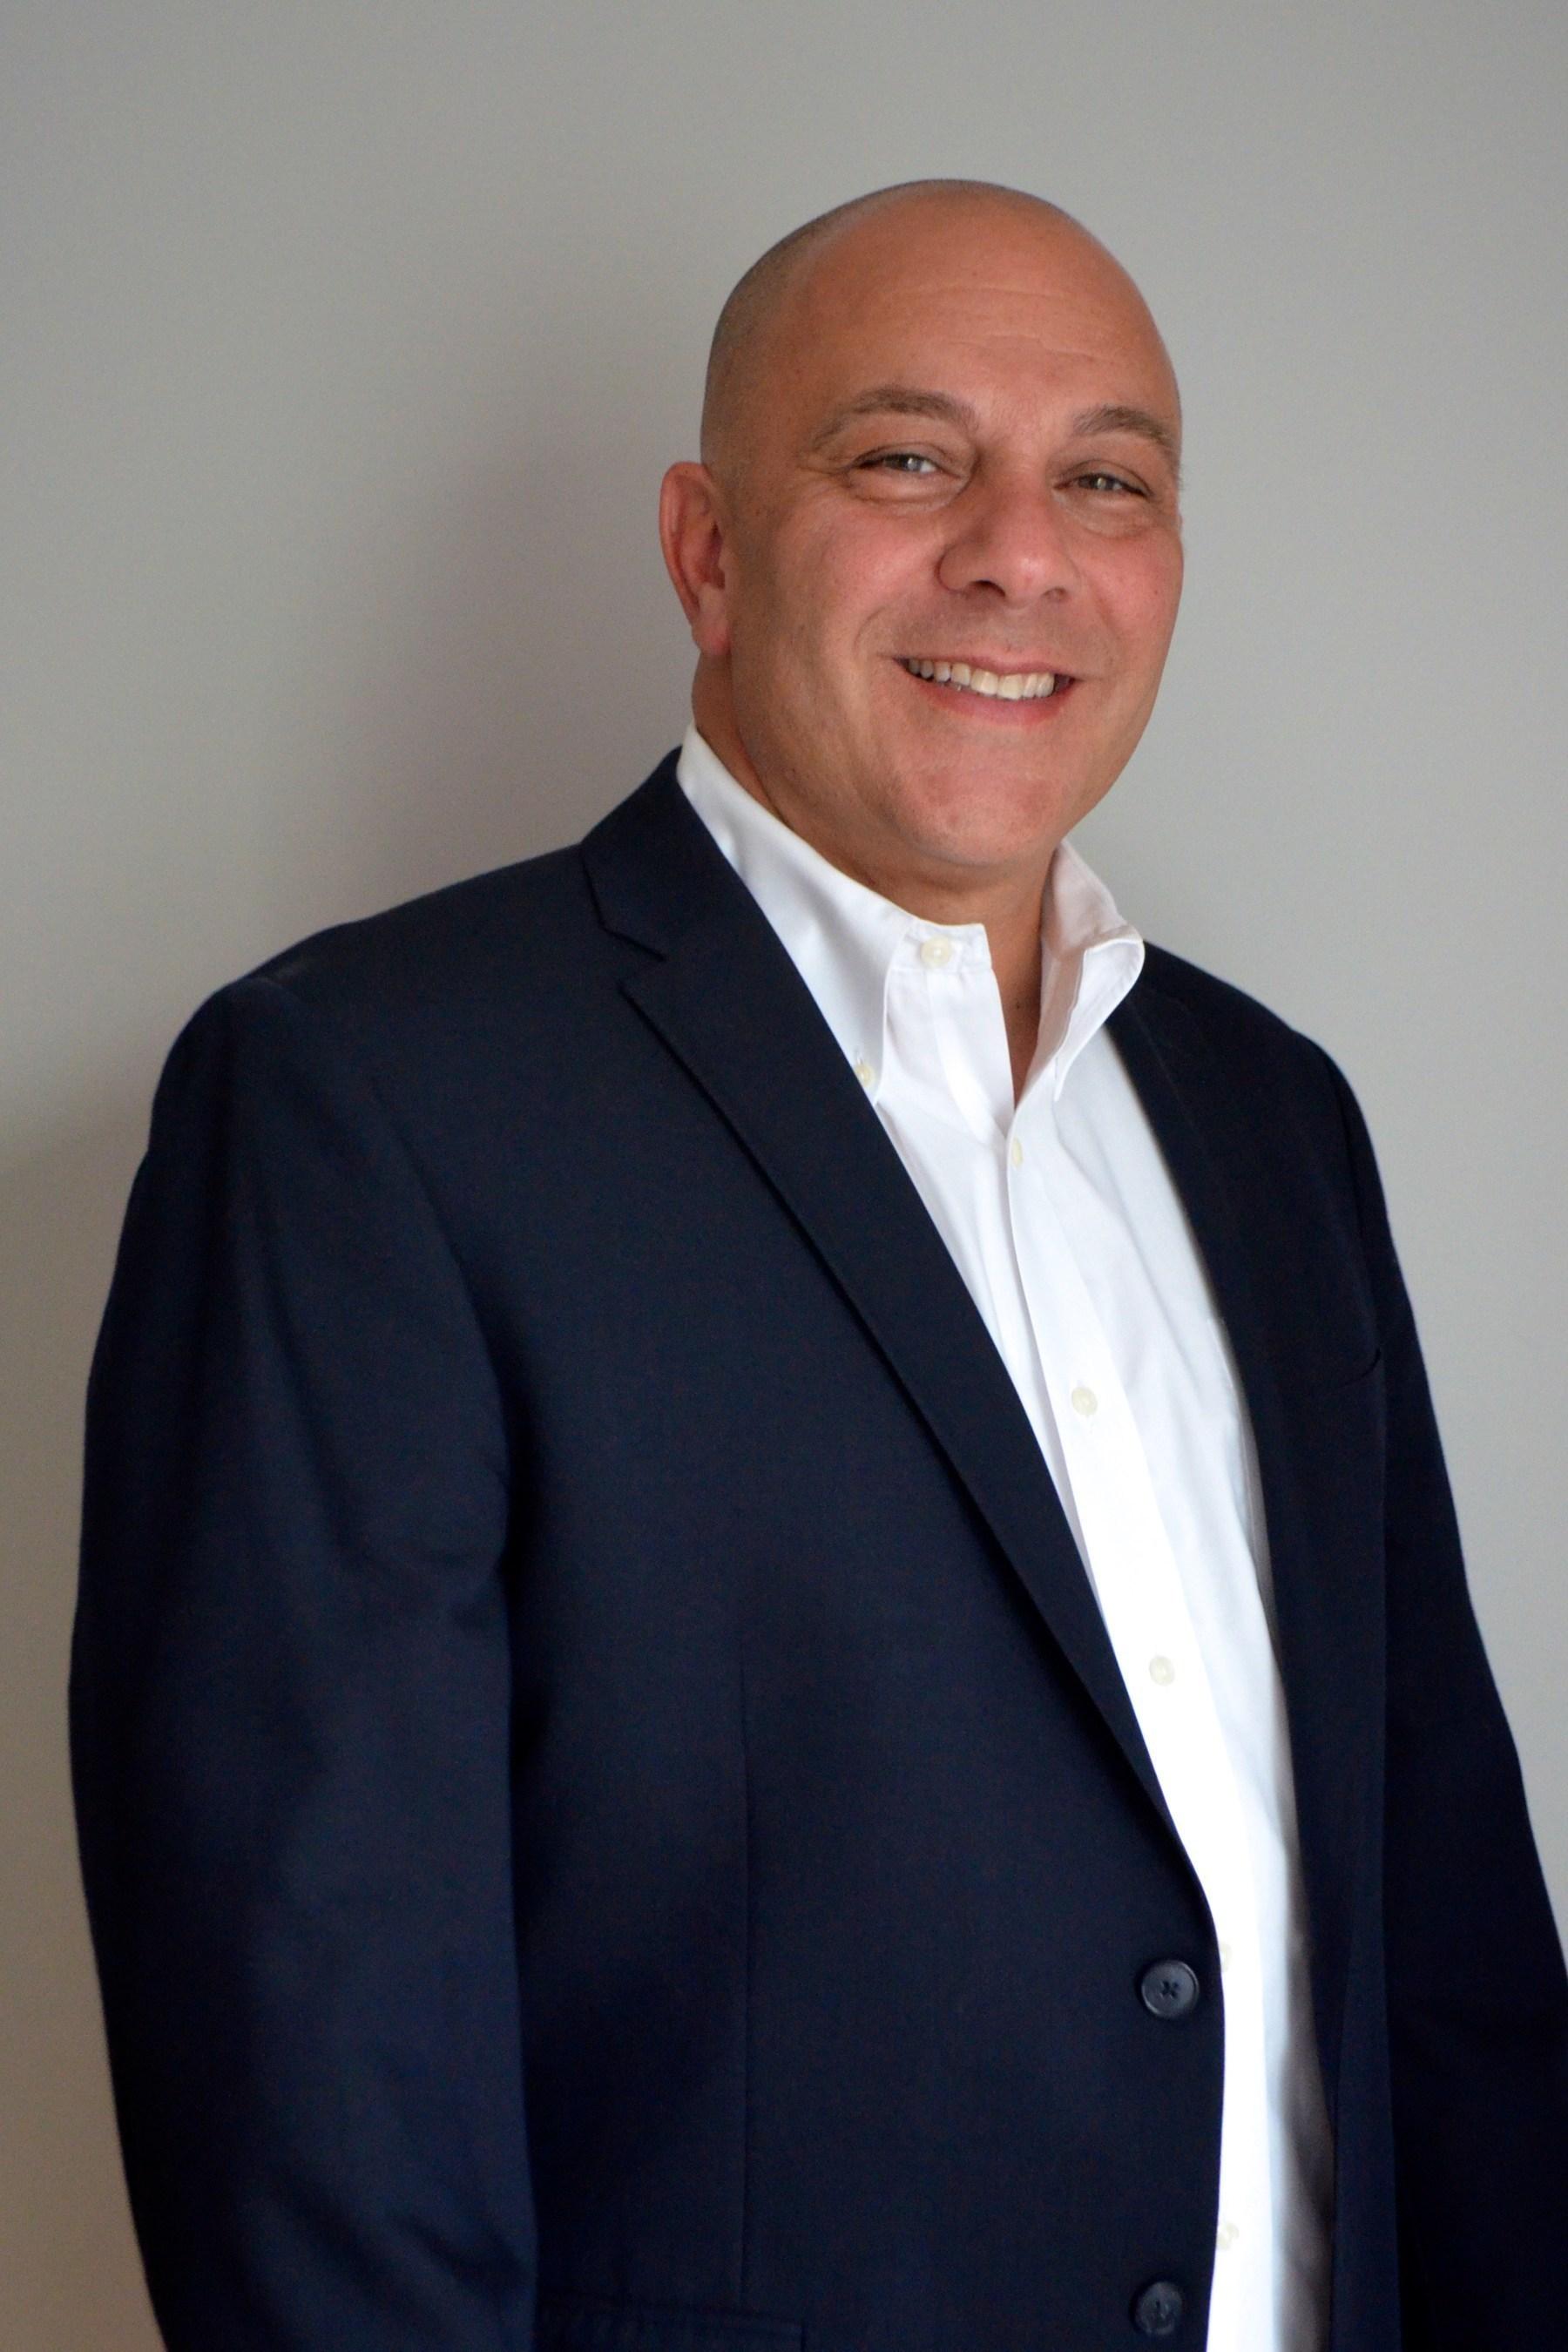 CONTROLTEK announces Salvatore Armato as Director of Sales